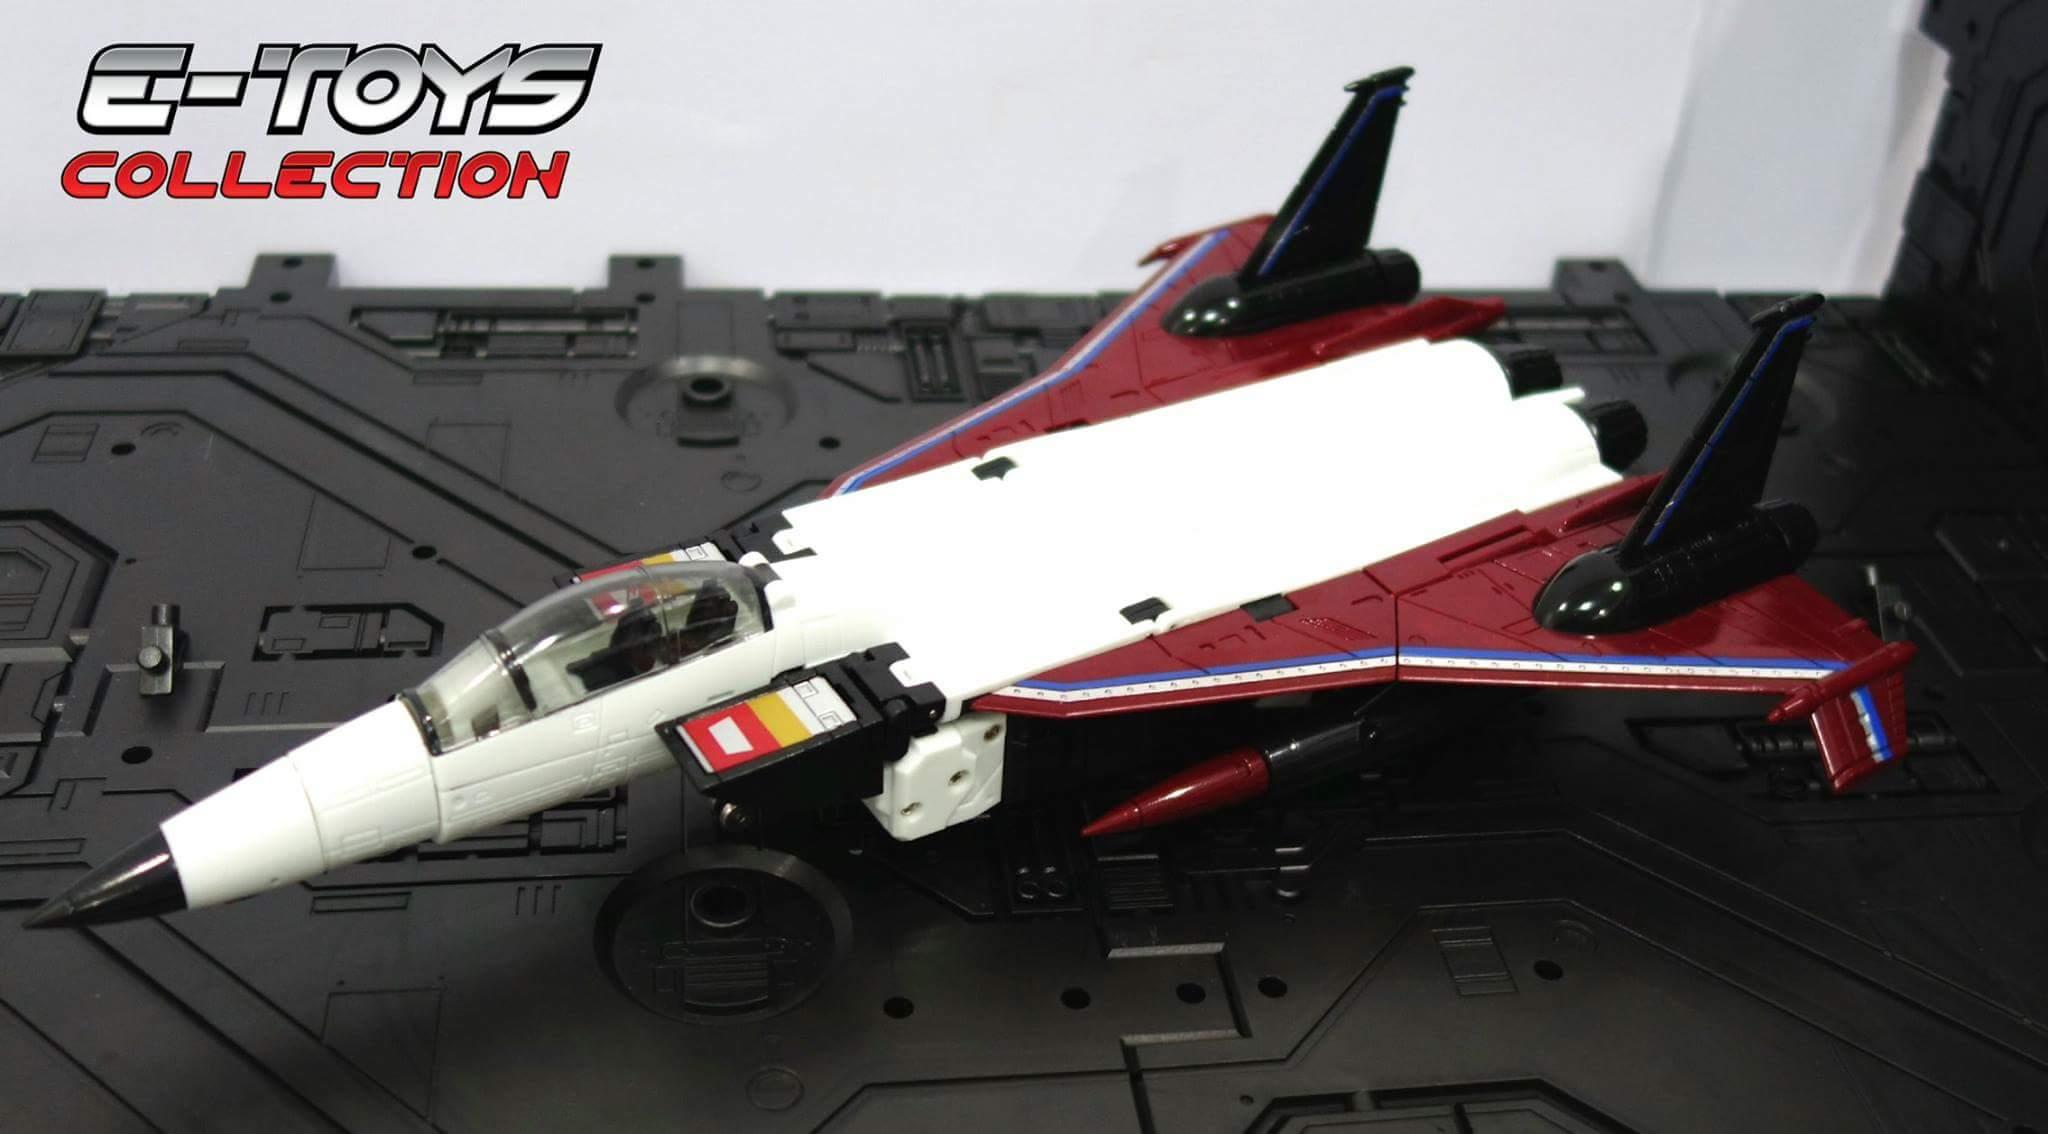 [ToyWorld] Produit Tiers - TW-M02A Combustor (Ramjet/Statoréacto), TW-M02B Assault (Thrust/Fatalo), TW-M02C Requiem (Dirge/Funébro) - Page 3 7z1XJUVu